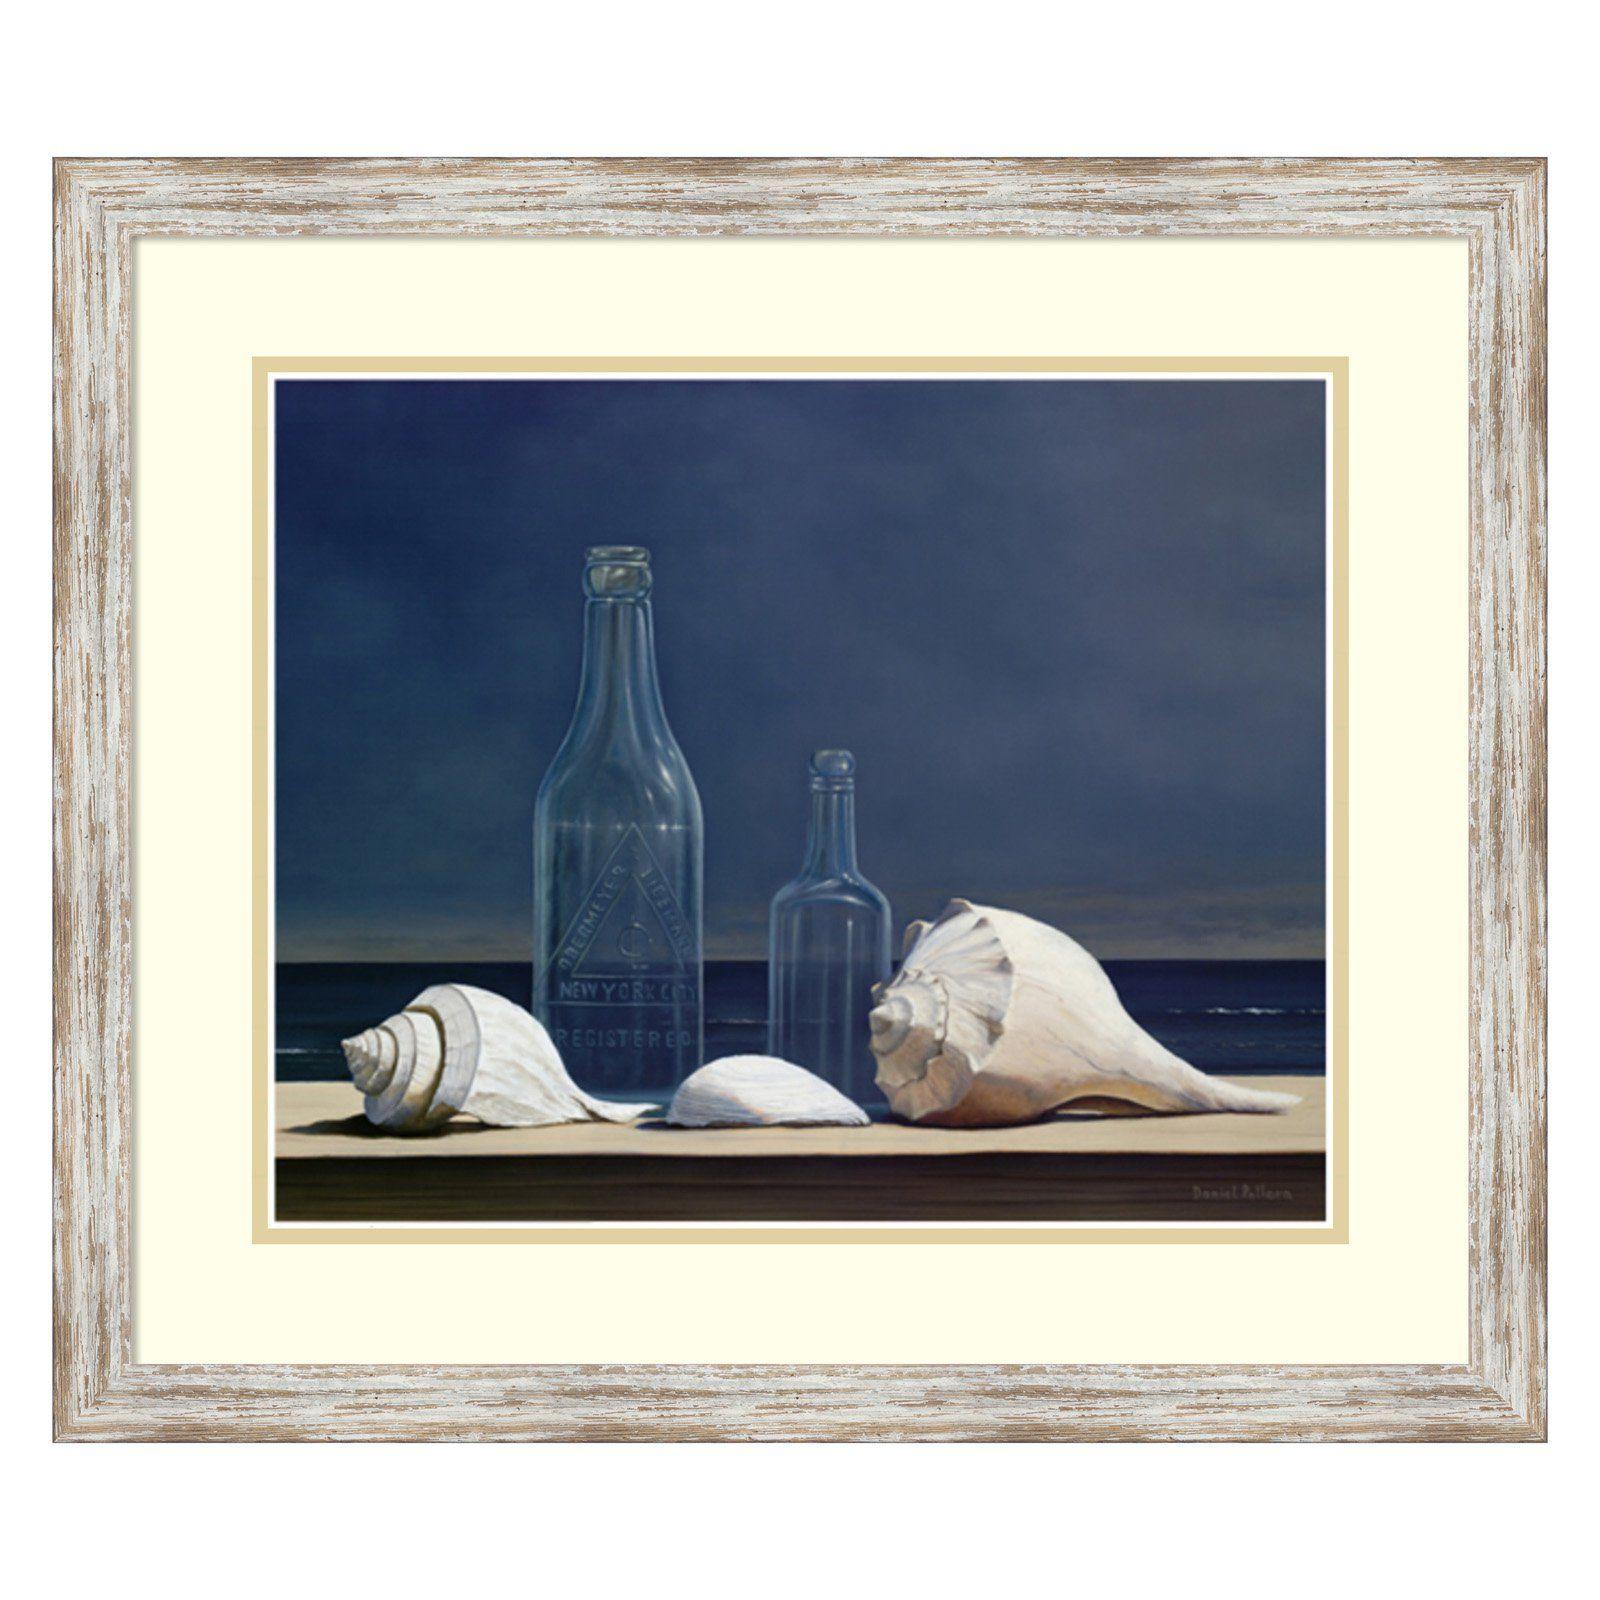 Amanti art seaglass and shells framed print by daniel